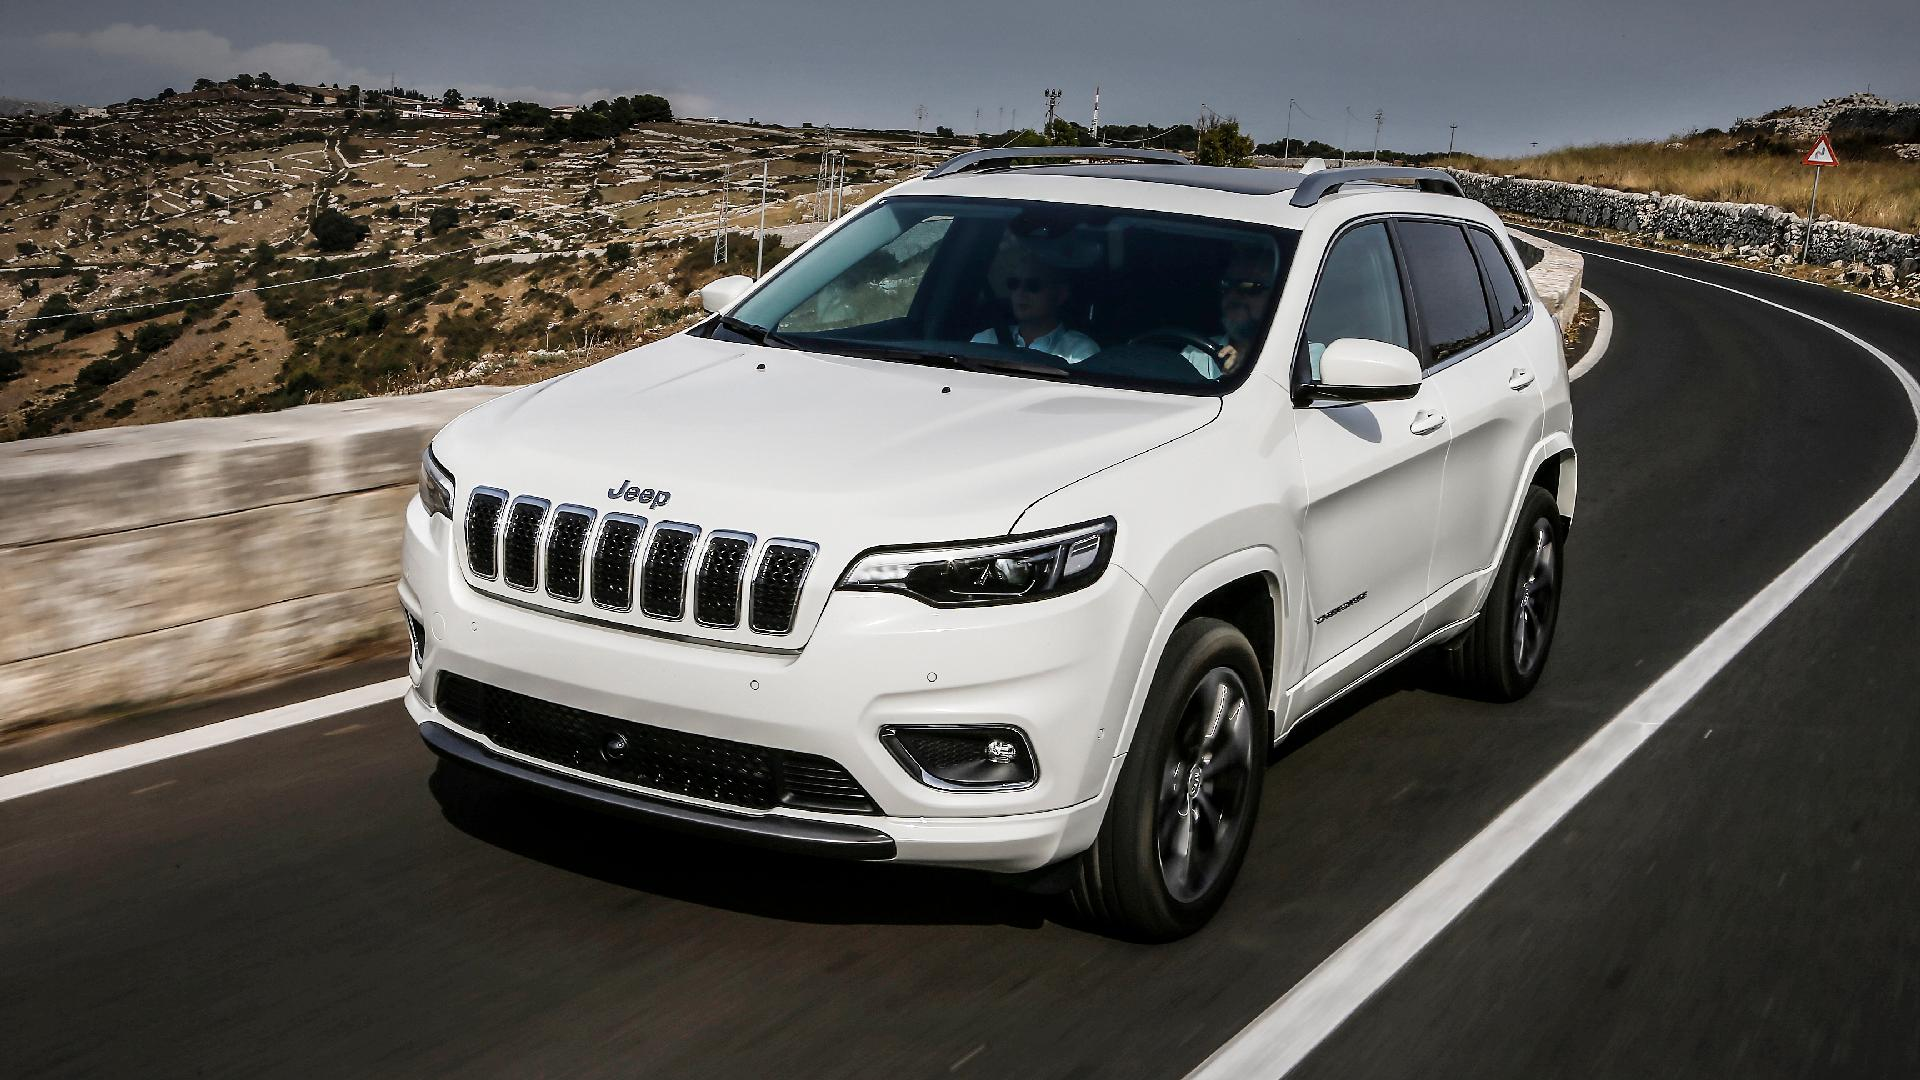 JEEP Cherokee 2.0 GME Active Drive I Overland aut